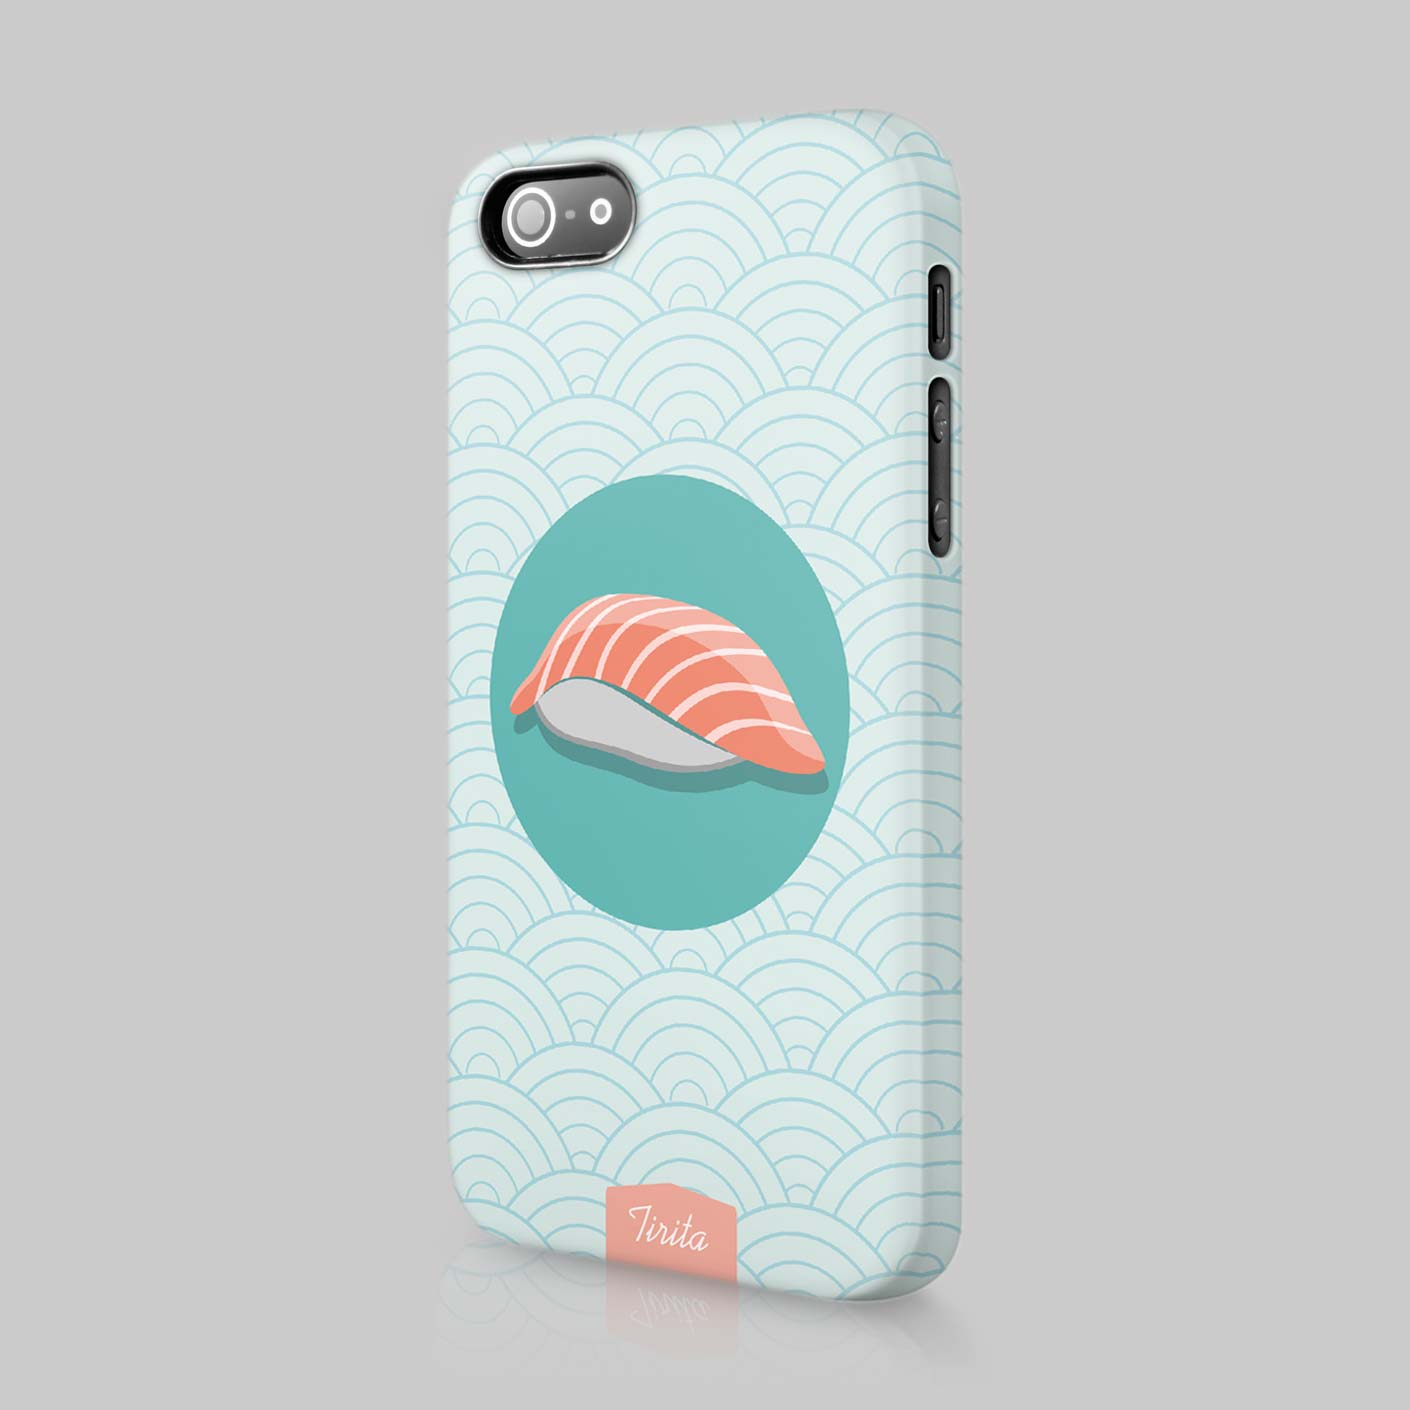 Tirita Sushi Japanese Food Japan Phone Case Hard Cover For